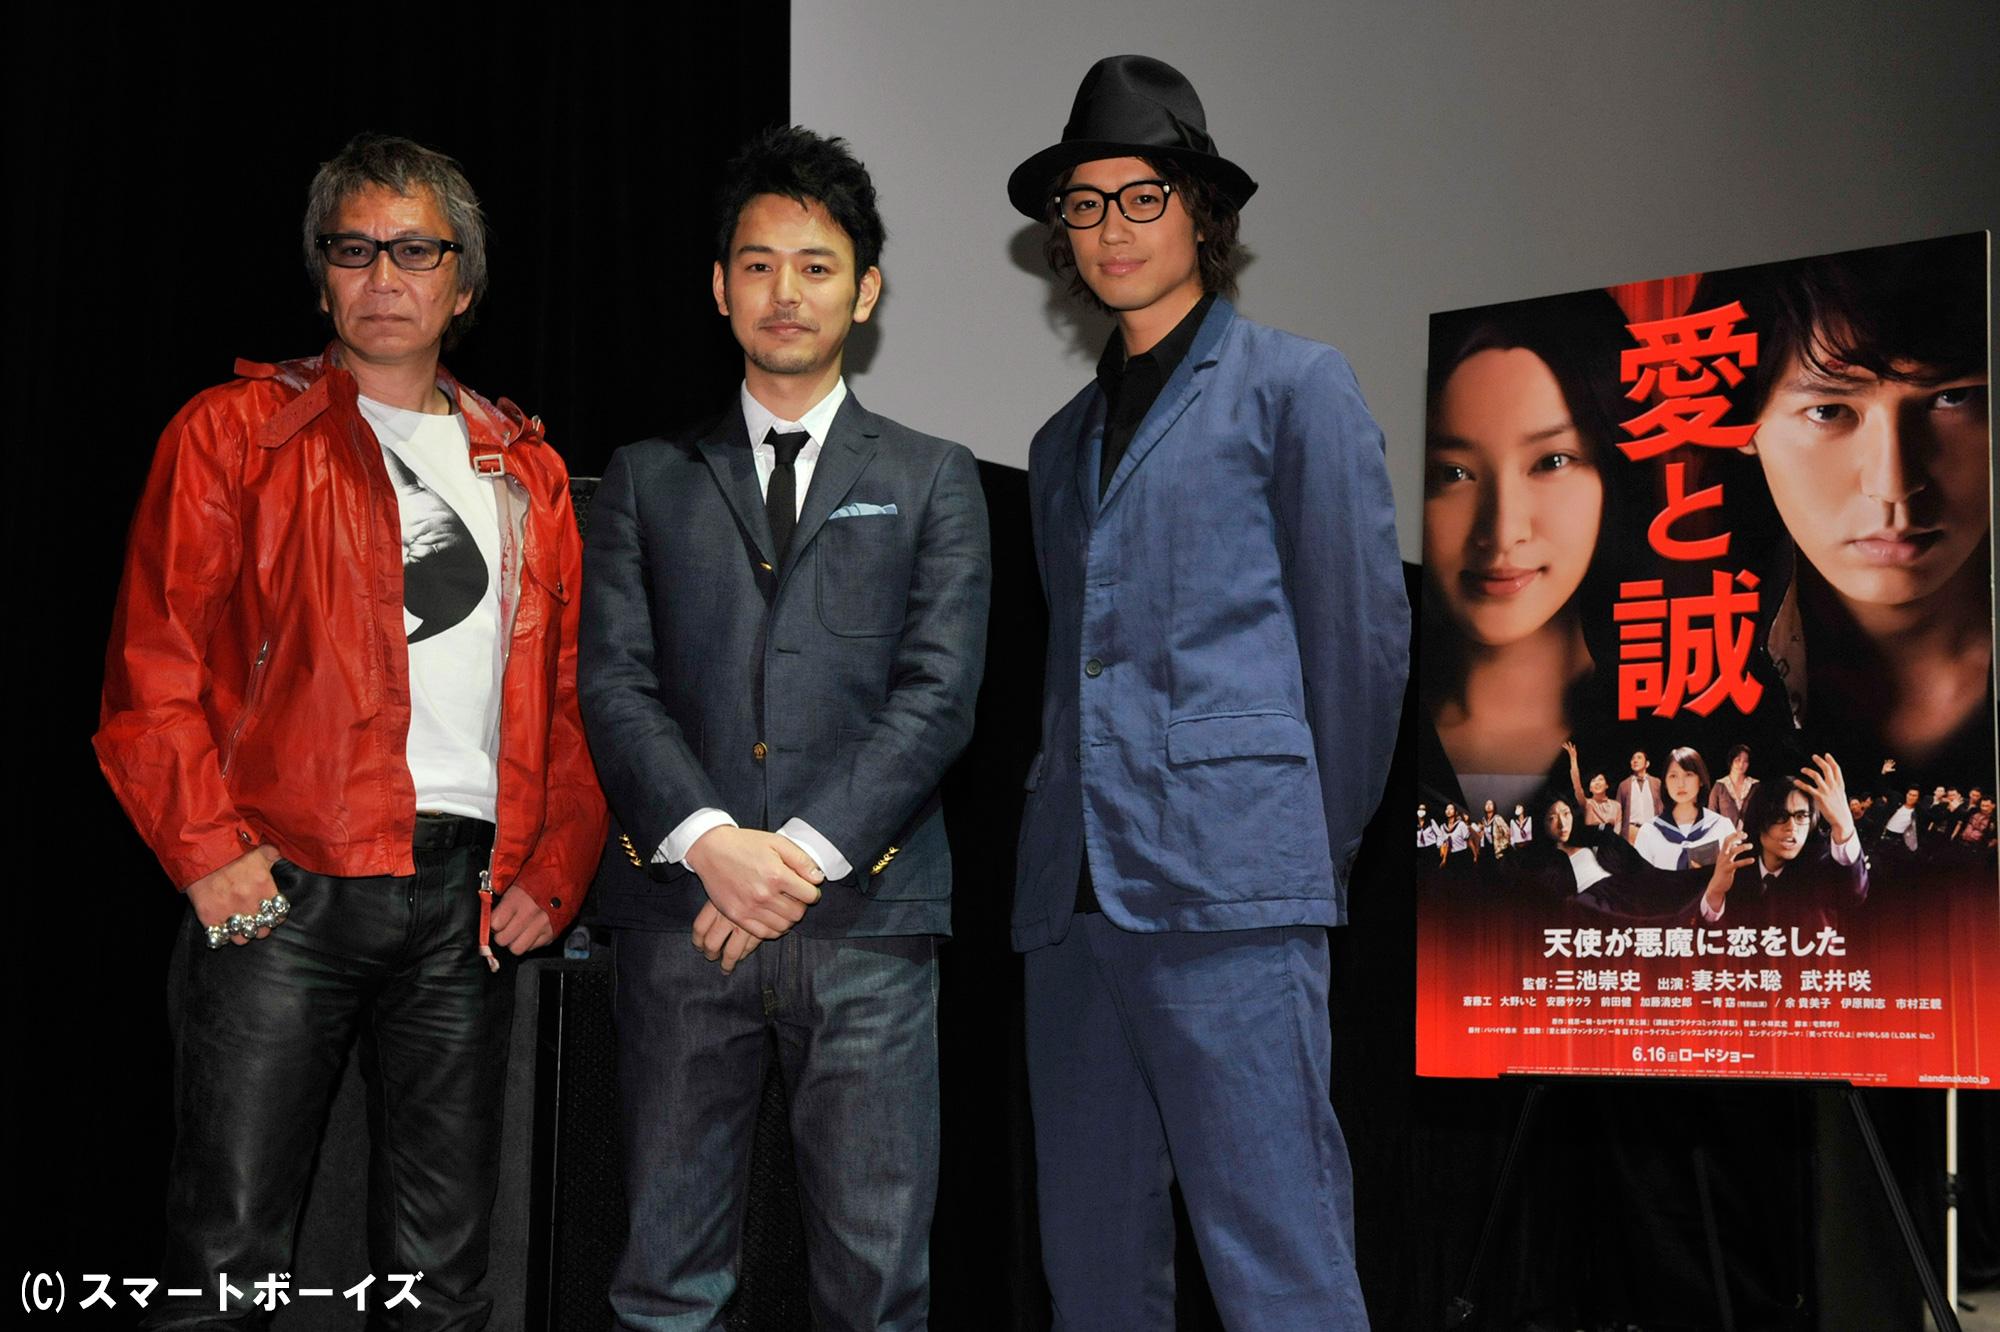 左から三池崇史監督、妻夫木聡、斎藤工